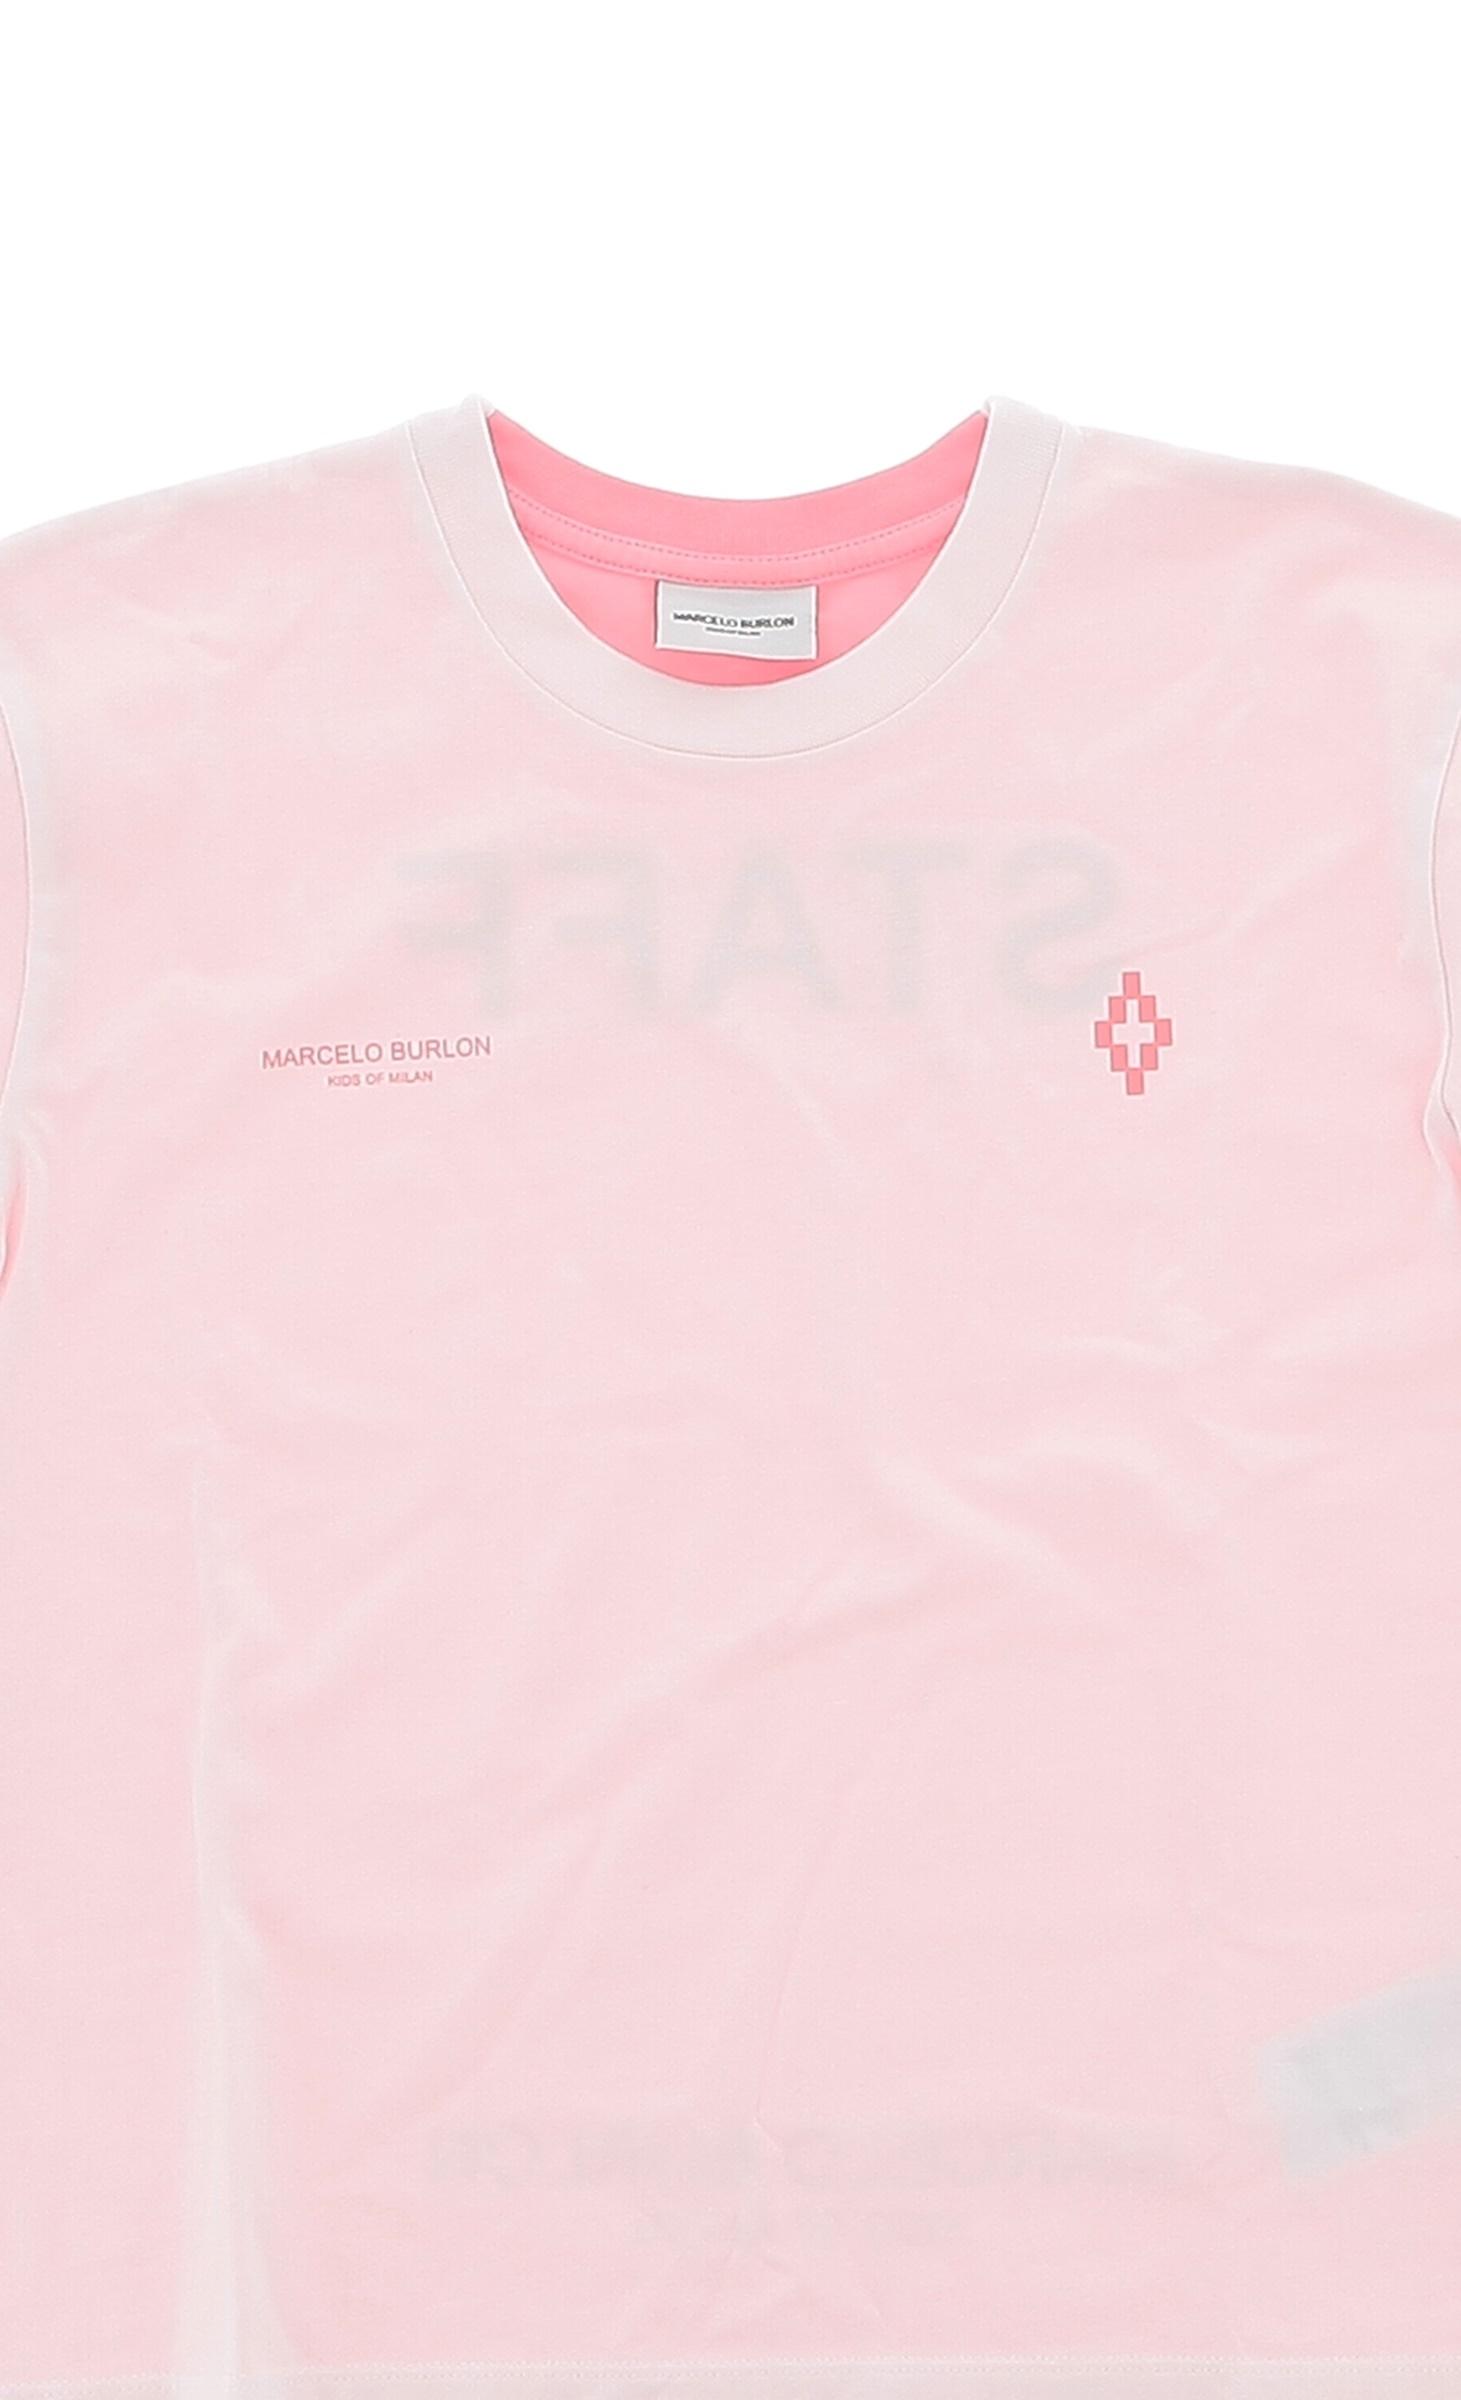 Marcelo Burlon t-shirt MARCELO BURLON KIDS OF MILAN | T-shirt | BMB10030010INVB000